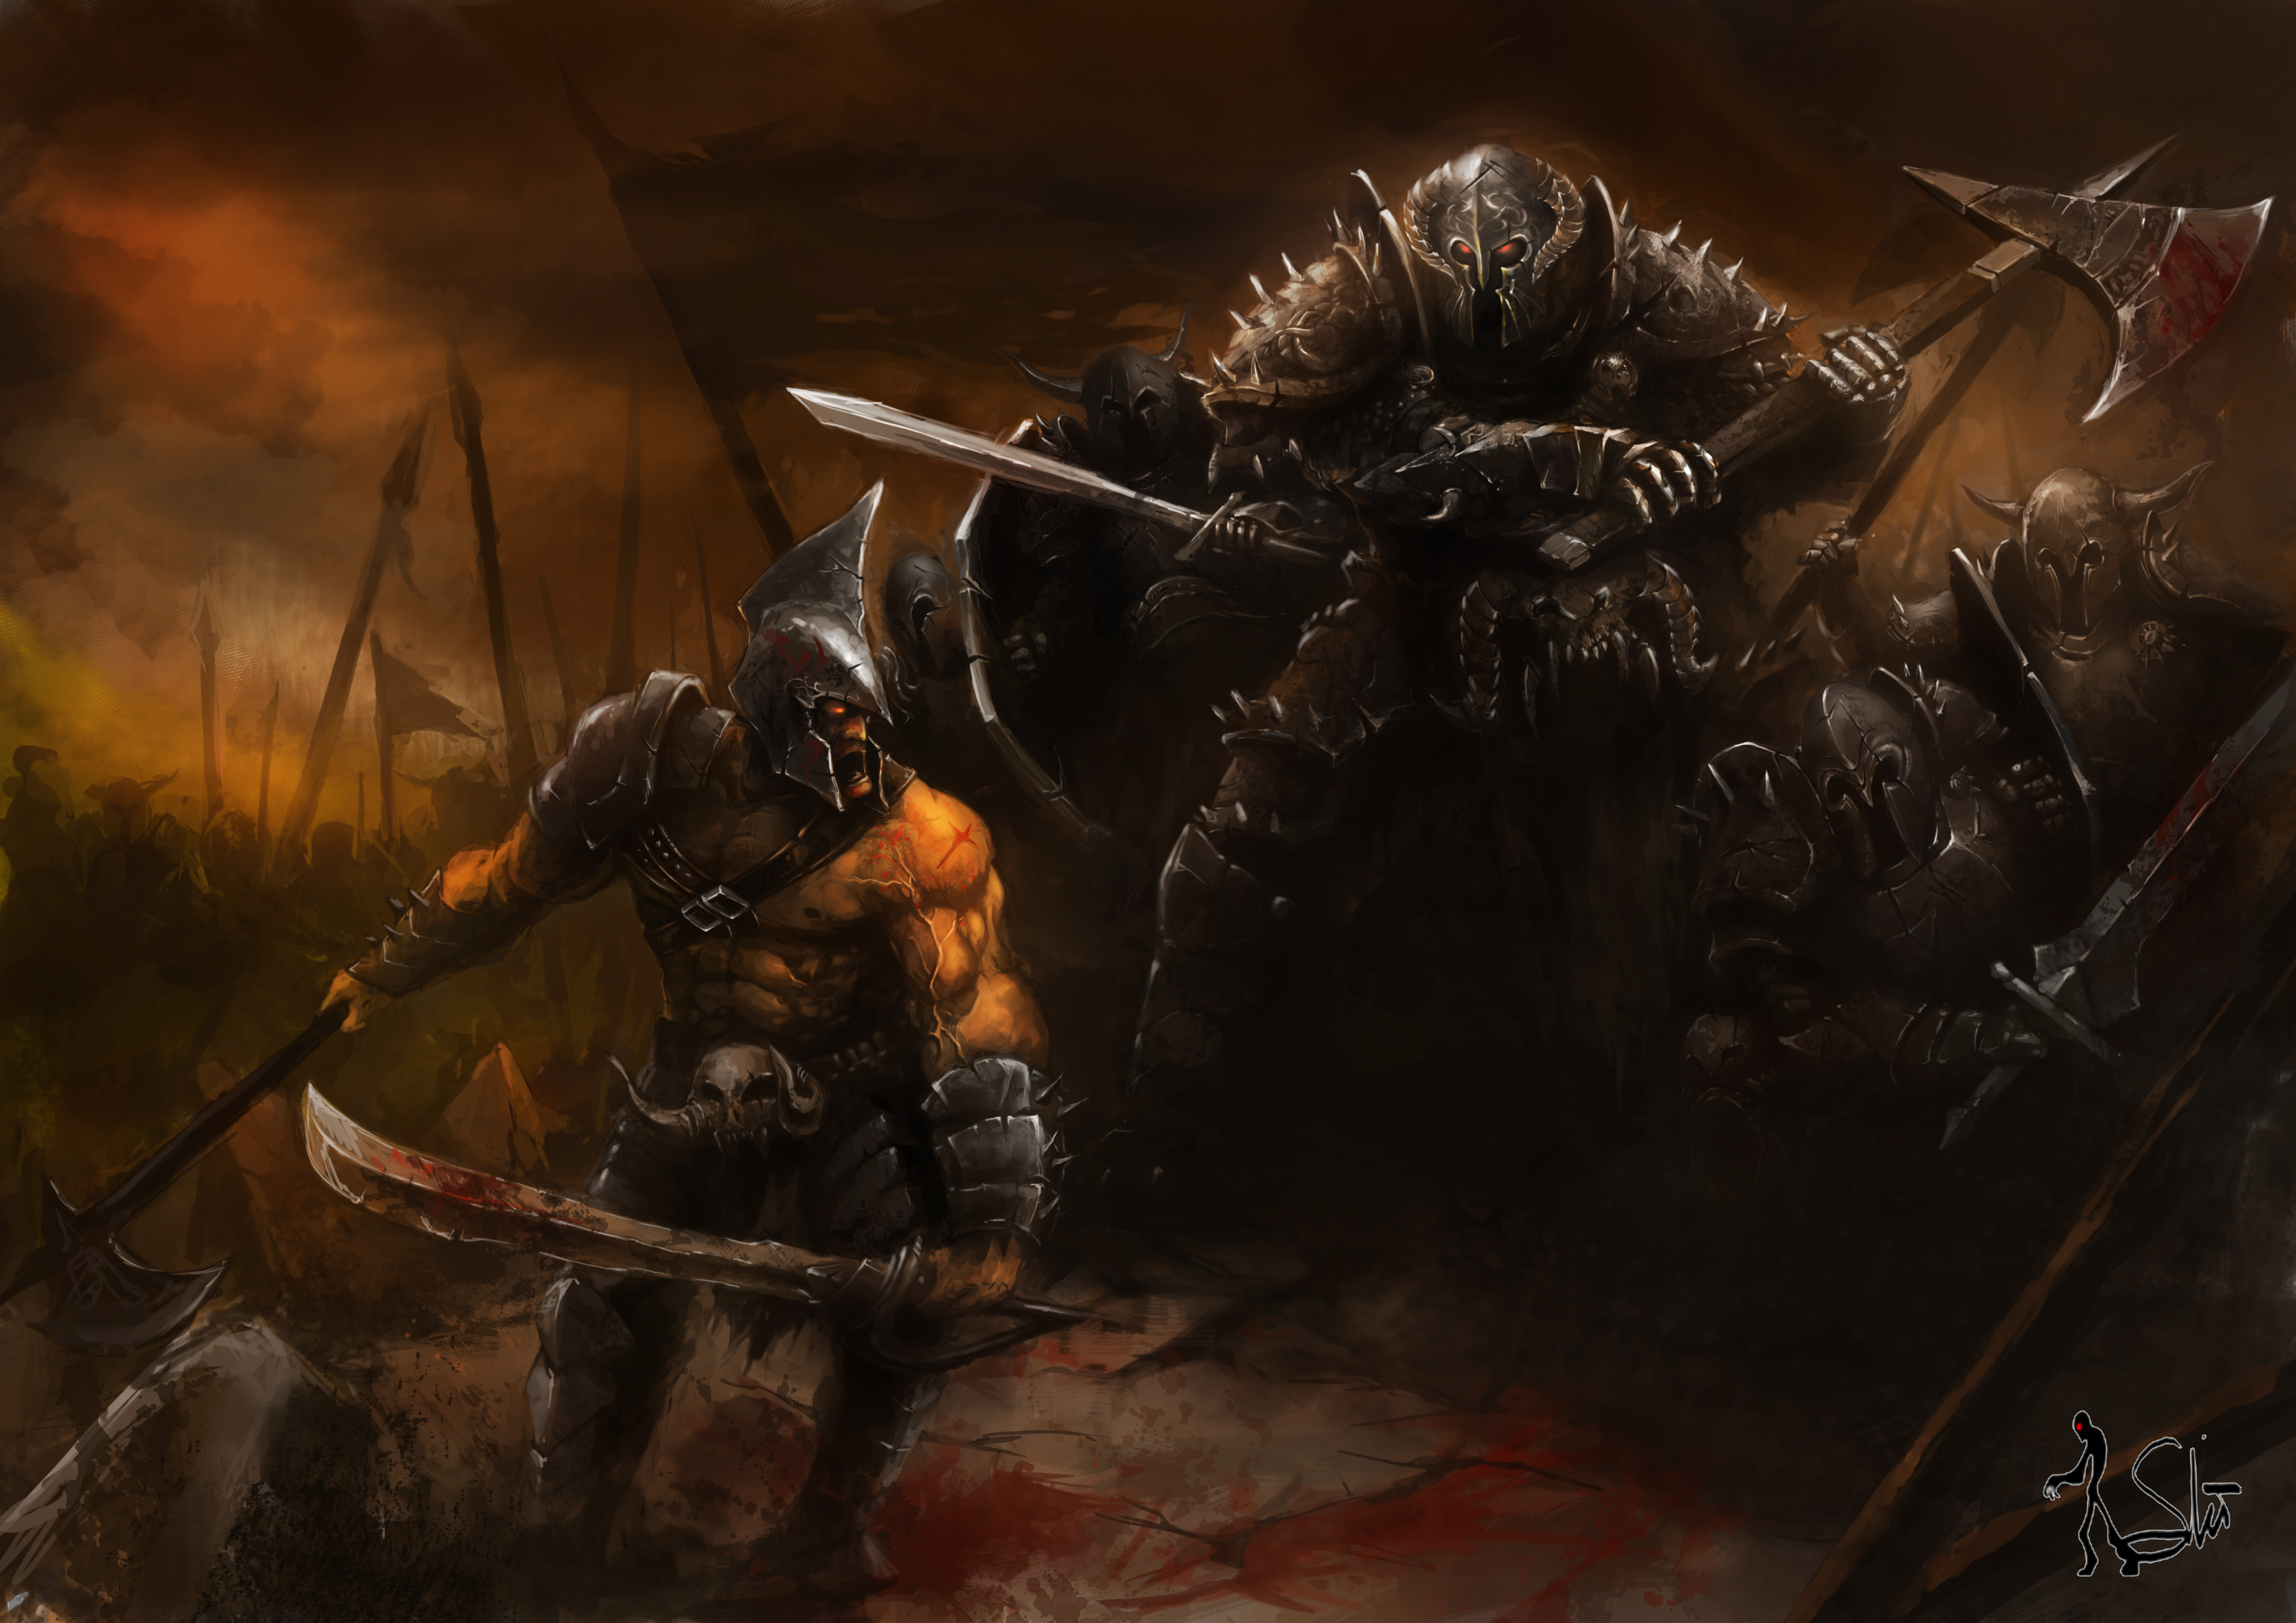 Warrior HD Wallpaper | Background Image | 3508x2480 | ID ...